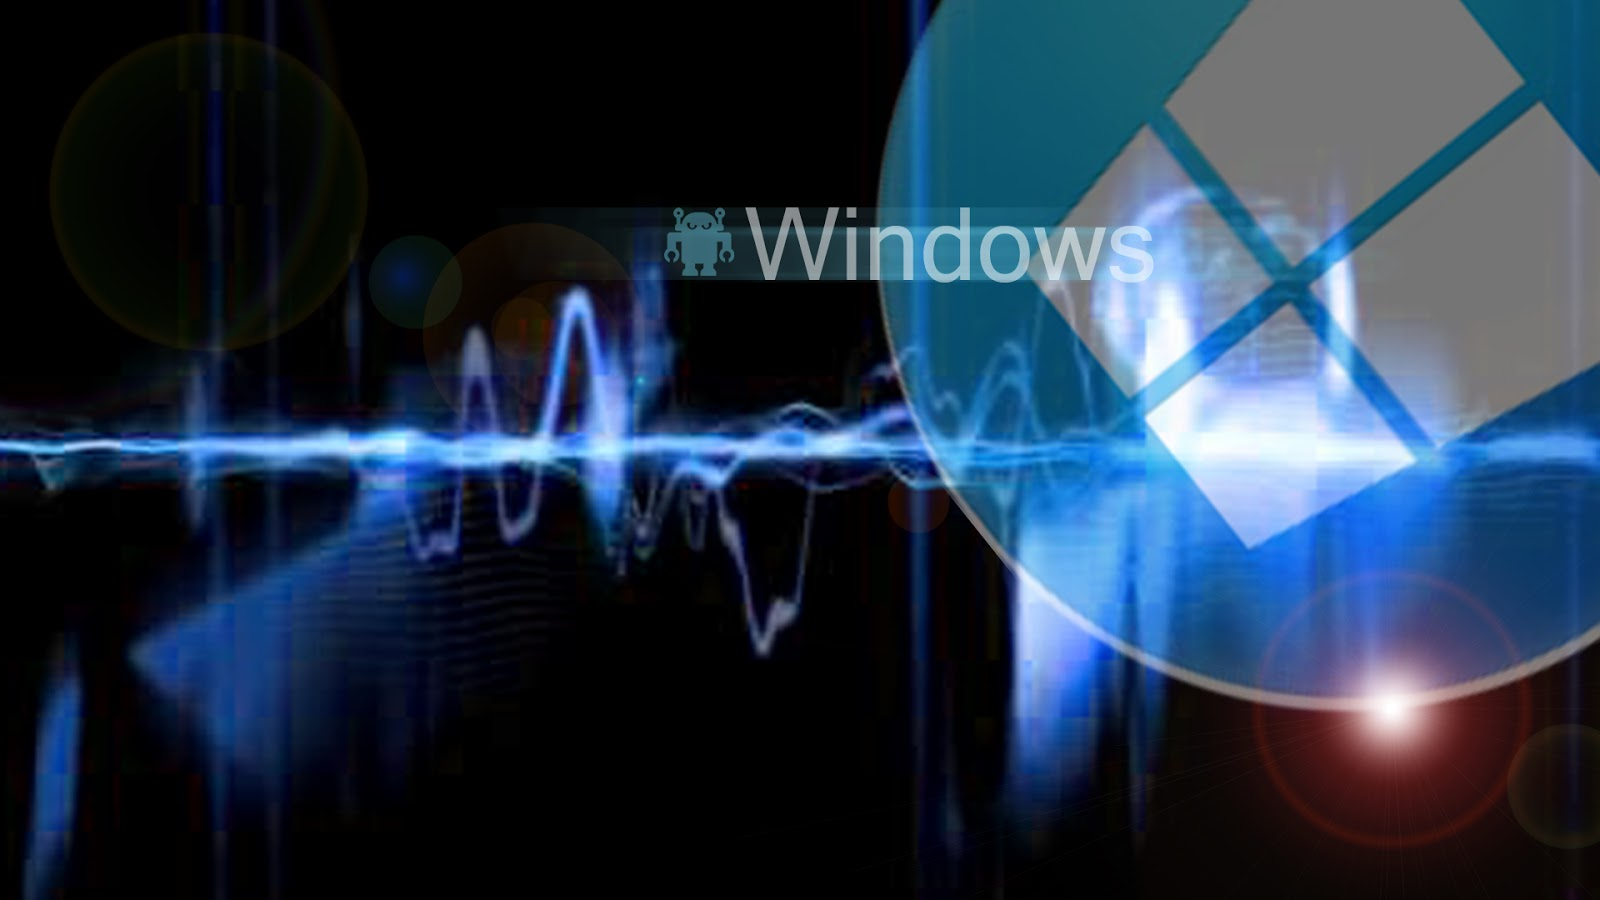 Unduh 680+ Wallpaper 3d Windows 10 Gambar HD Gratid